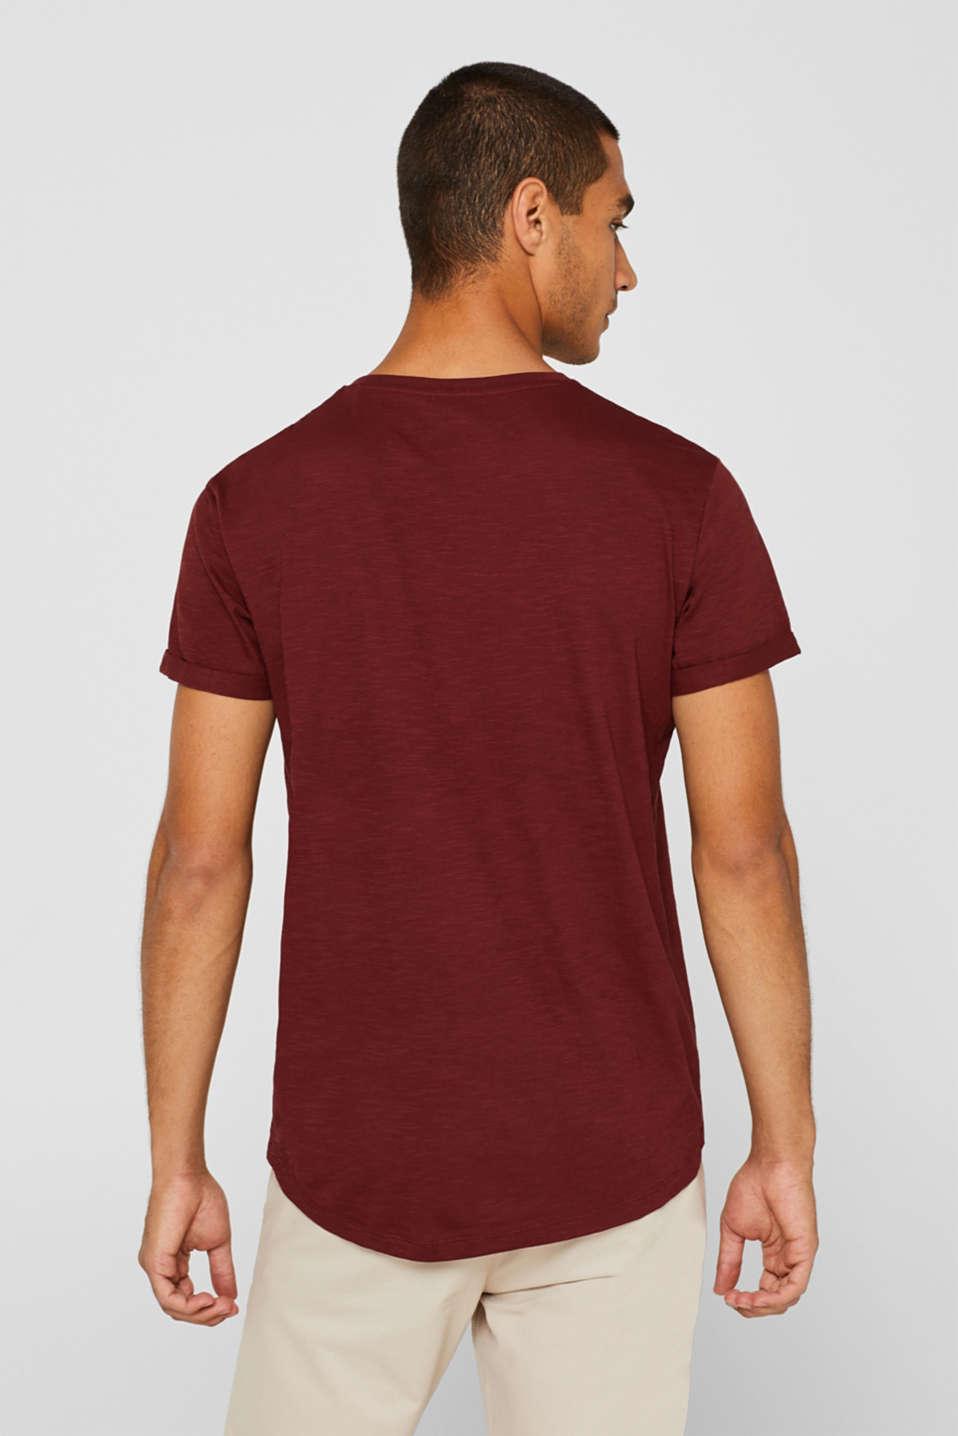 Slub jersey T-shirt in 100% cotton, TERRACOTTA, detail image number 3